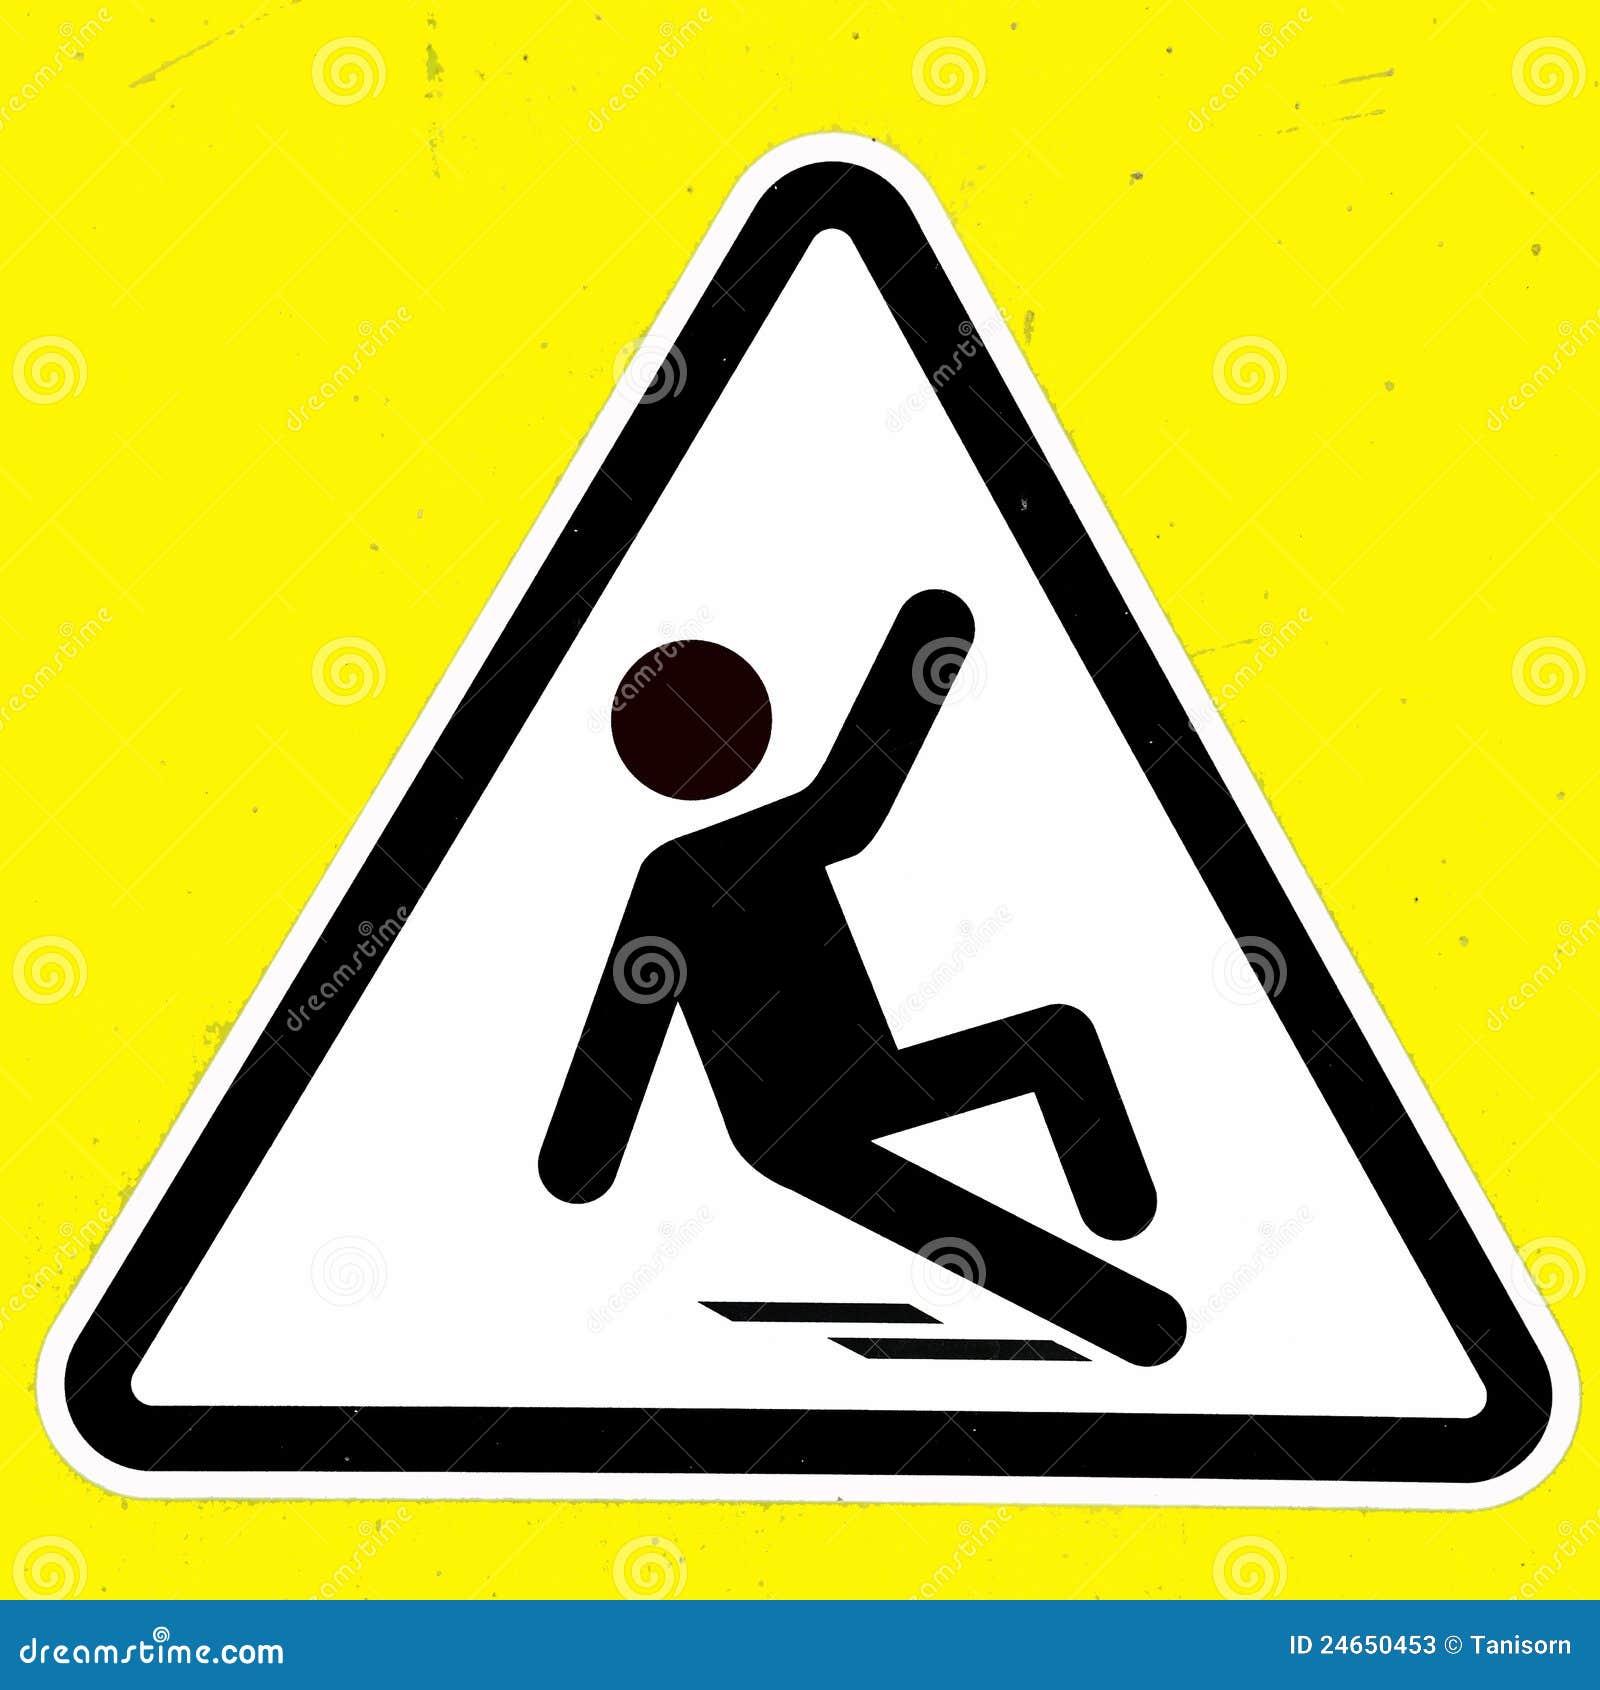 slippery wet floor sign stock photos image 24650453. Black Bedroom Furniture Sets. Home Design Ideas